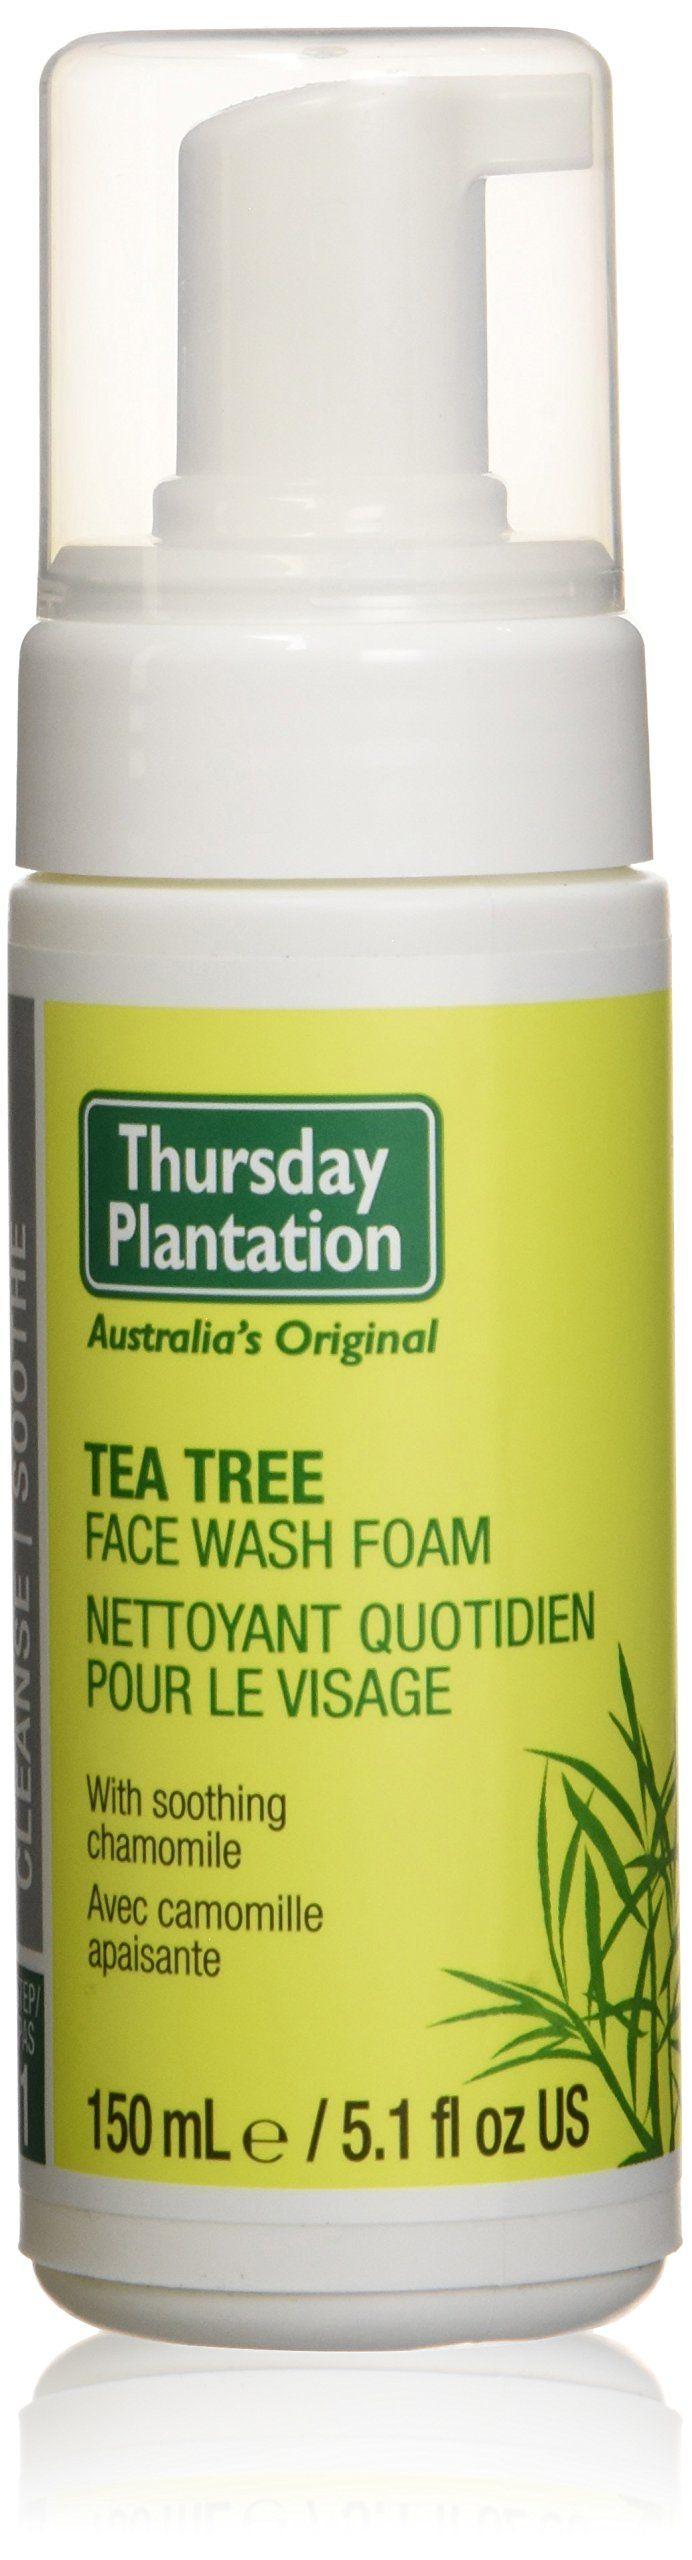 Tea Tree Face Wash Foam Thursday Plantation 5.1 fl oz Liquid. Thursday Plantation.